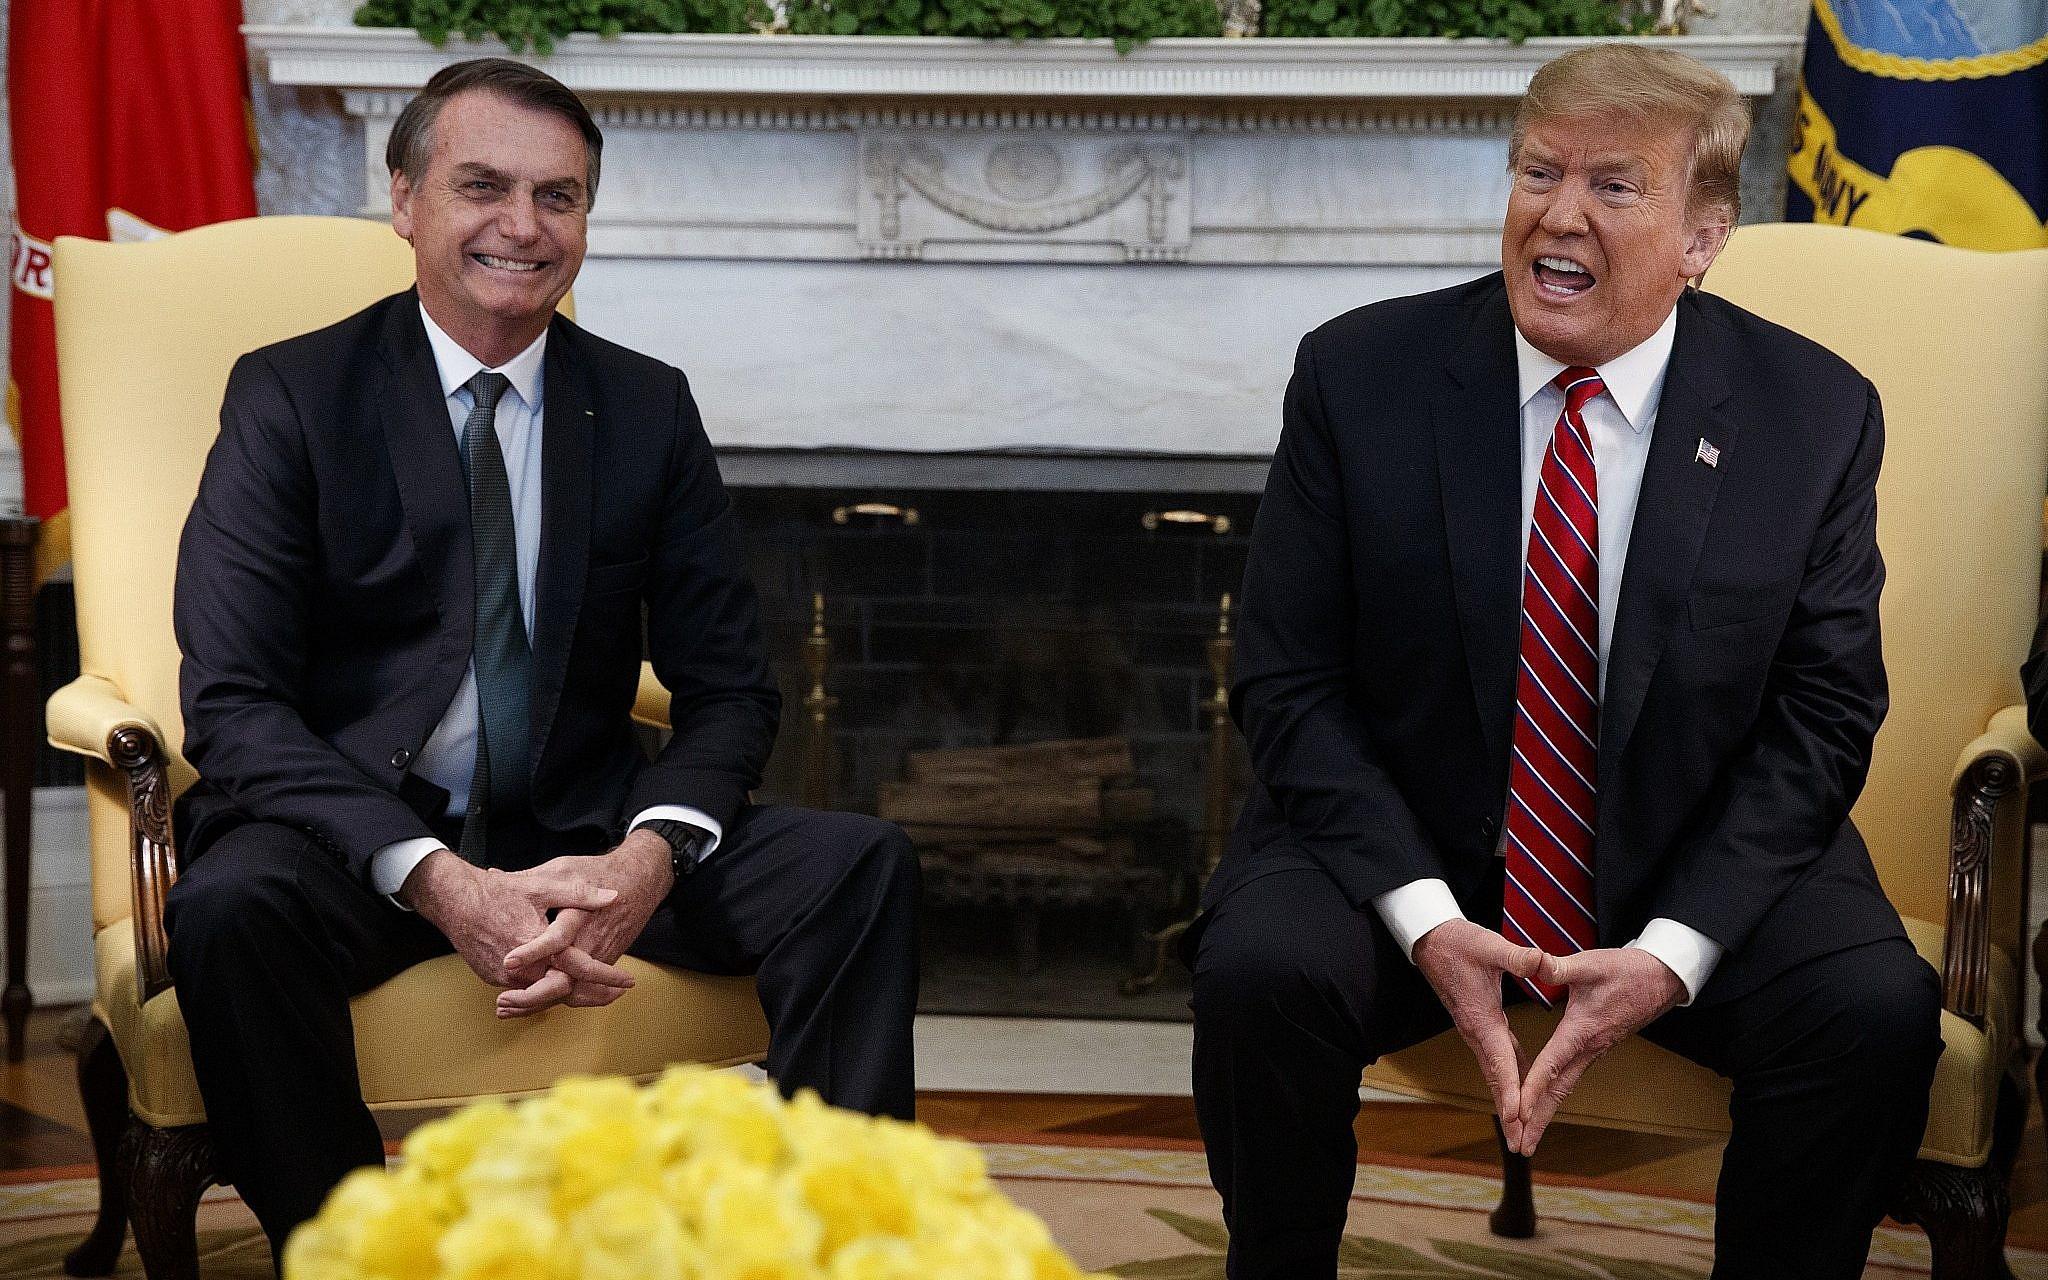 Bolsonaro says Brazil may withdraw from WHO